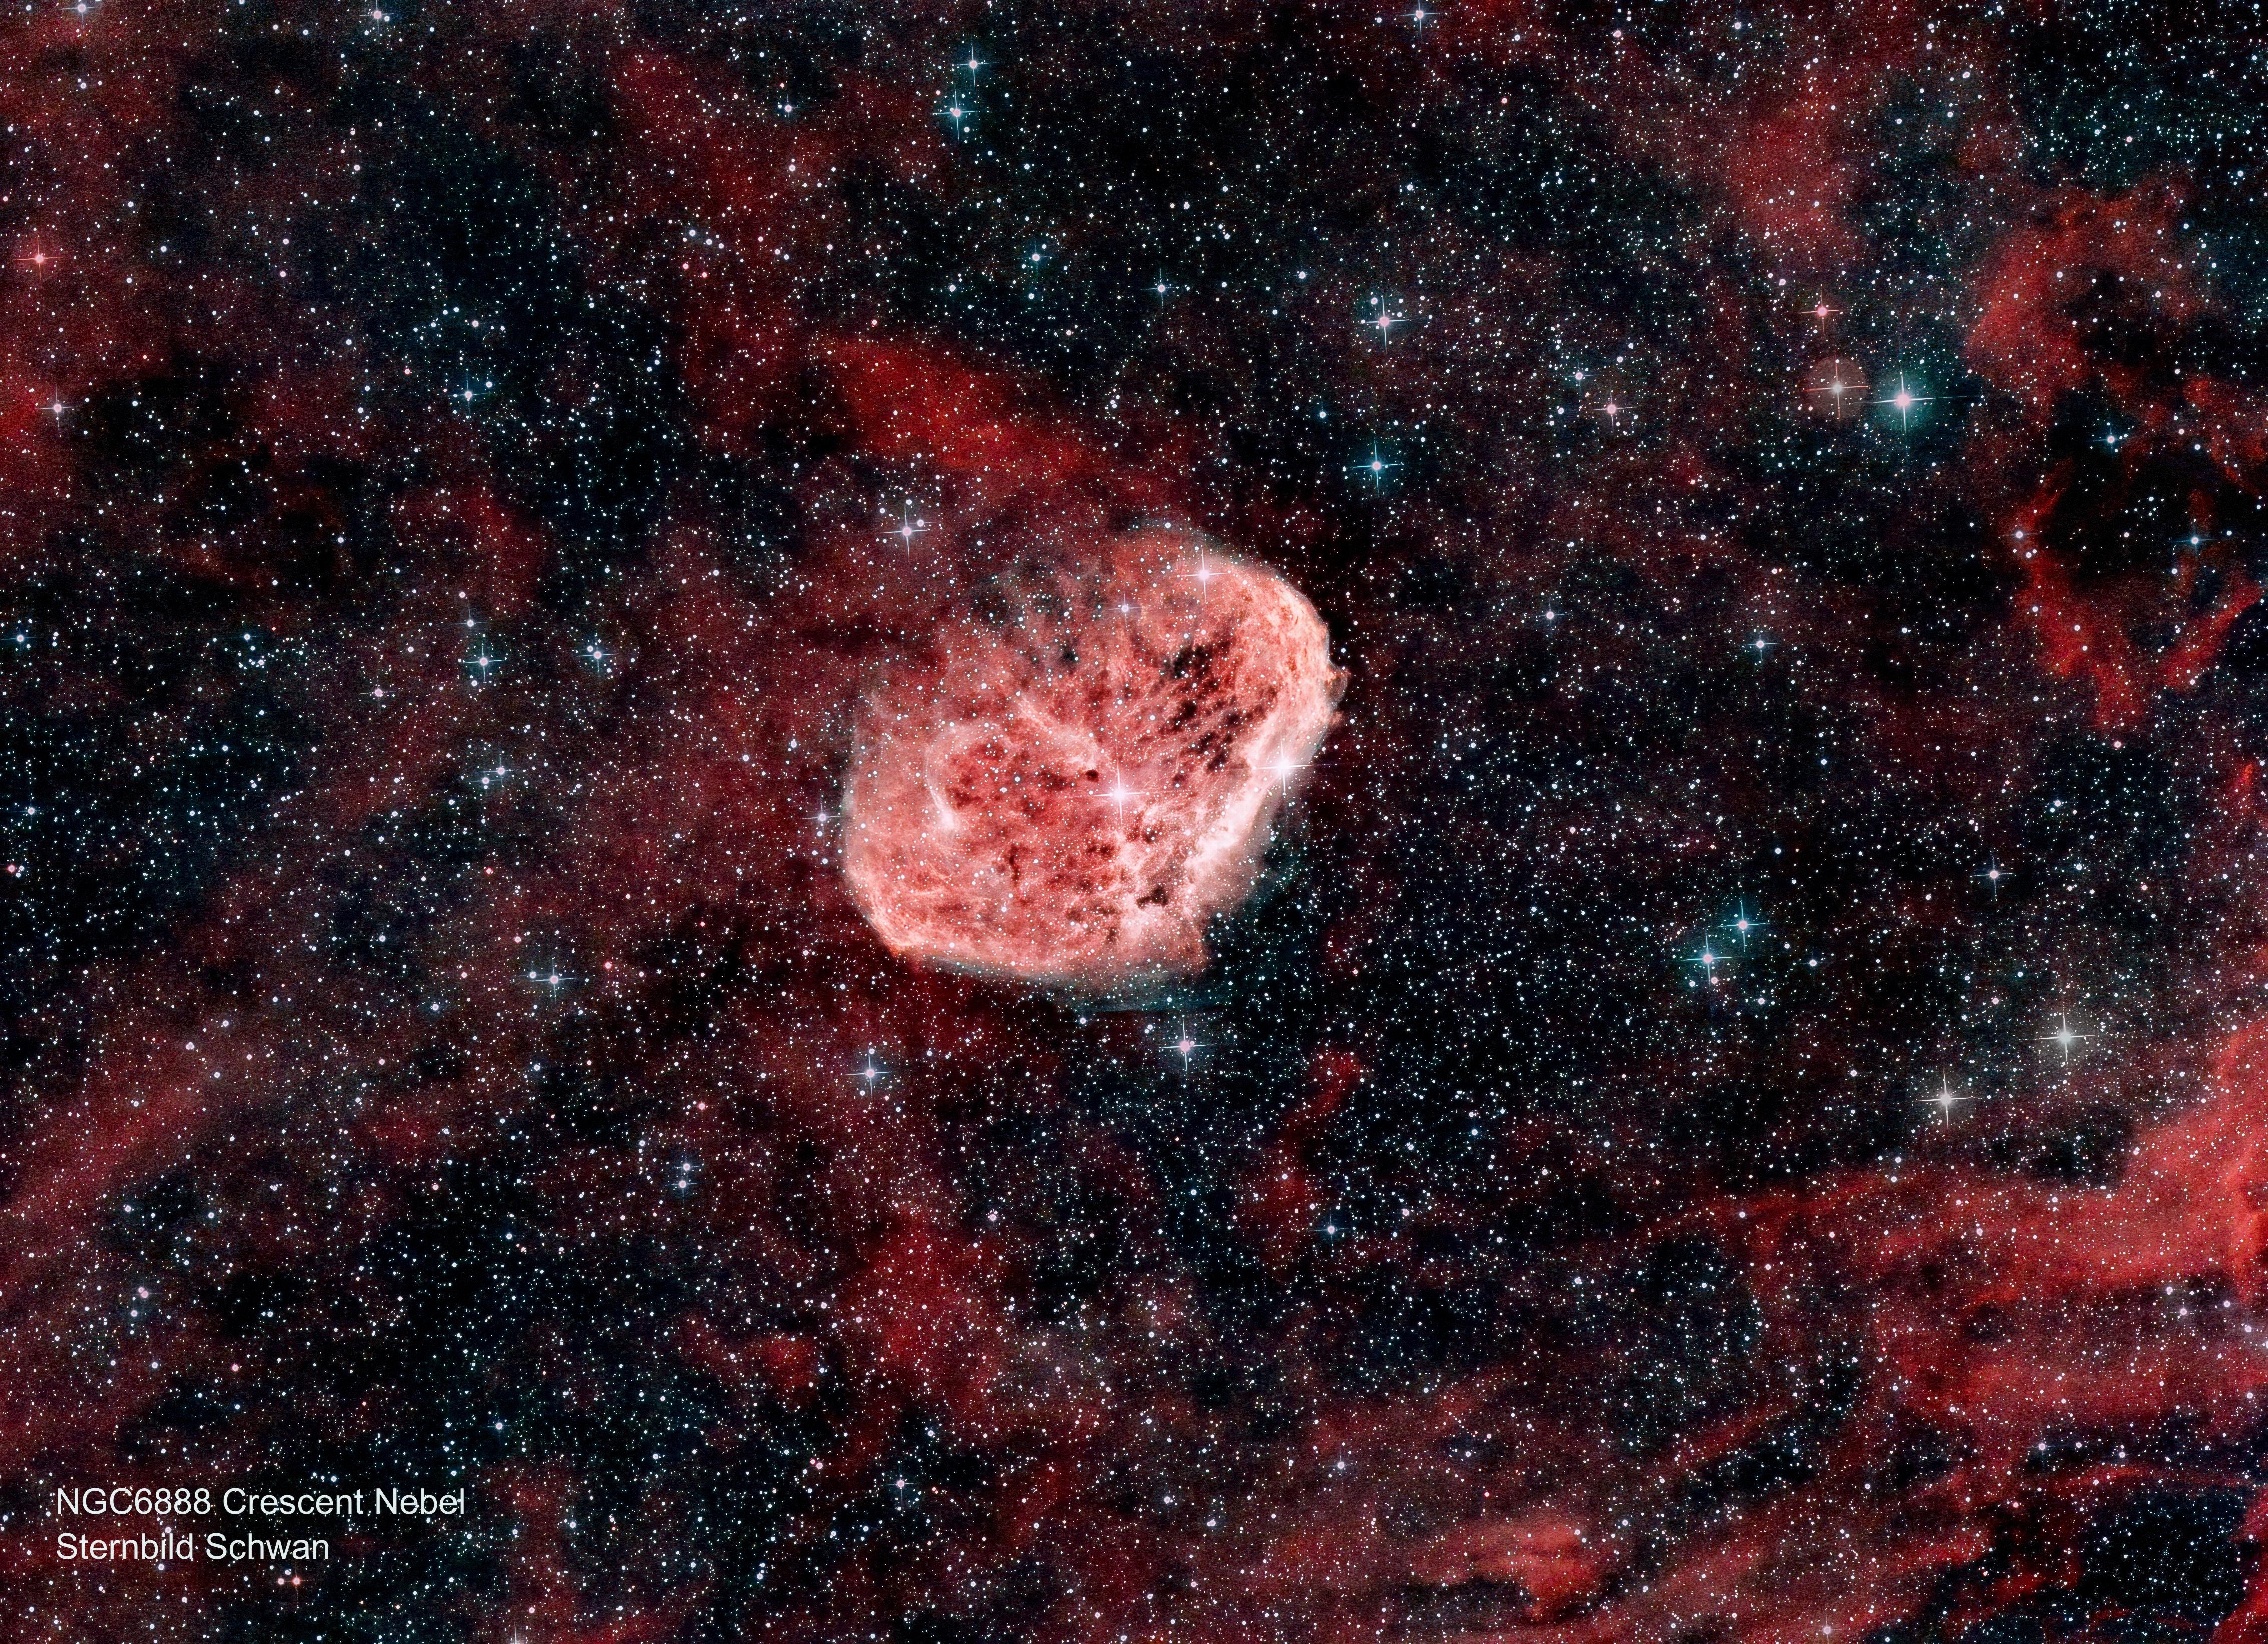 NGC 6888 Crescent Nebel